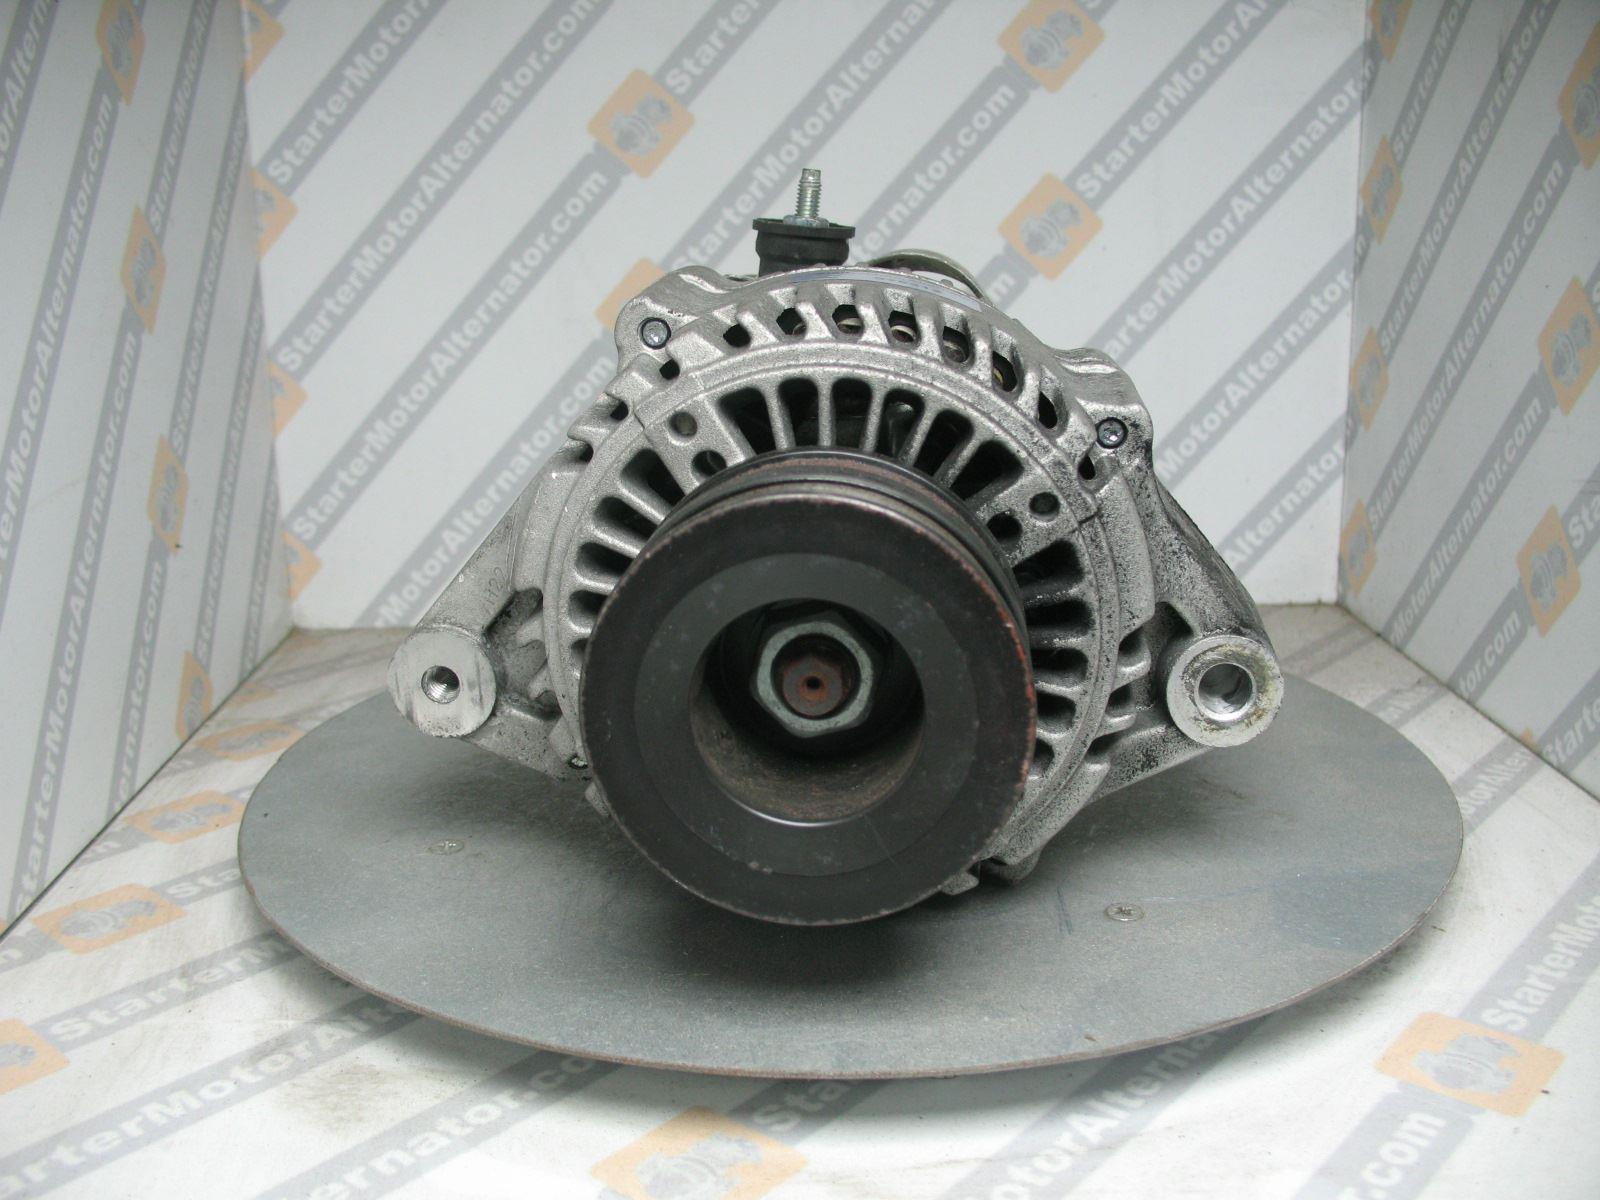 XIB1410 Alternator For Toyota